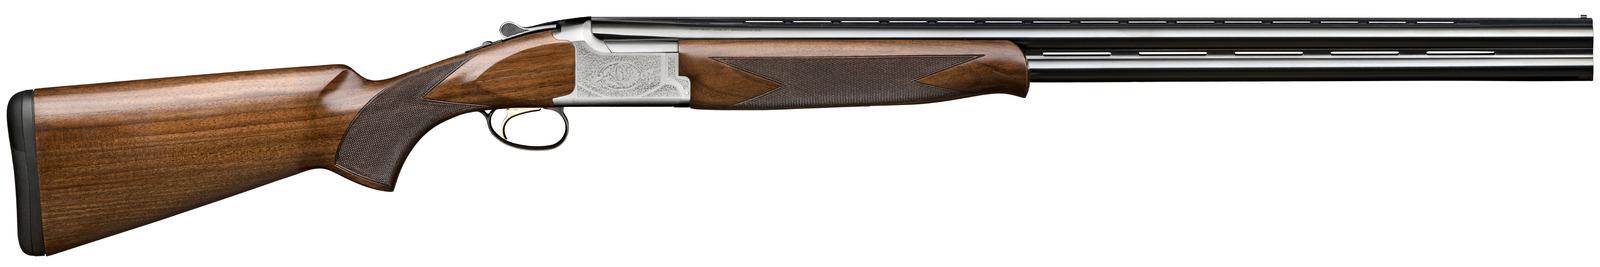 Browning B525 New Sporter